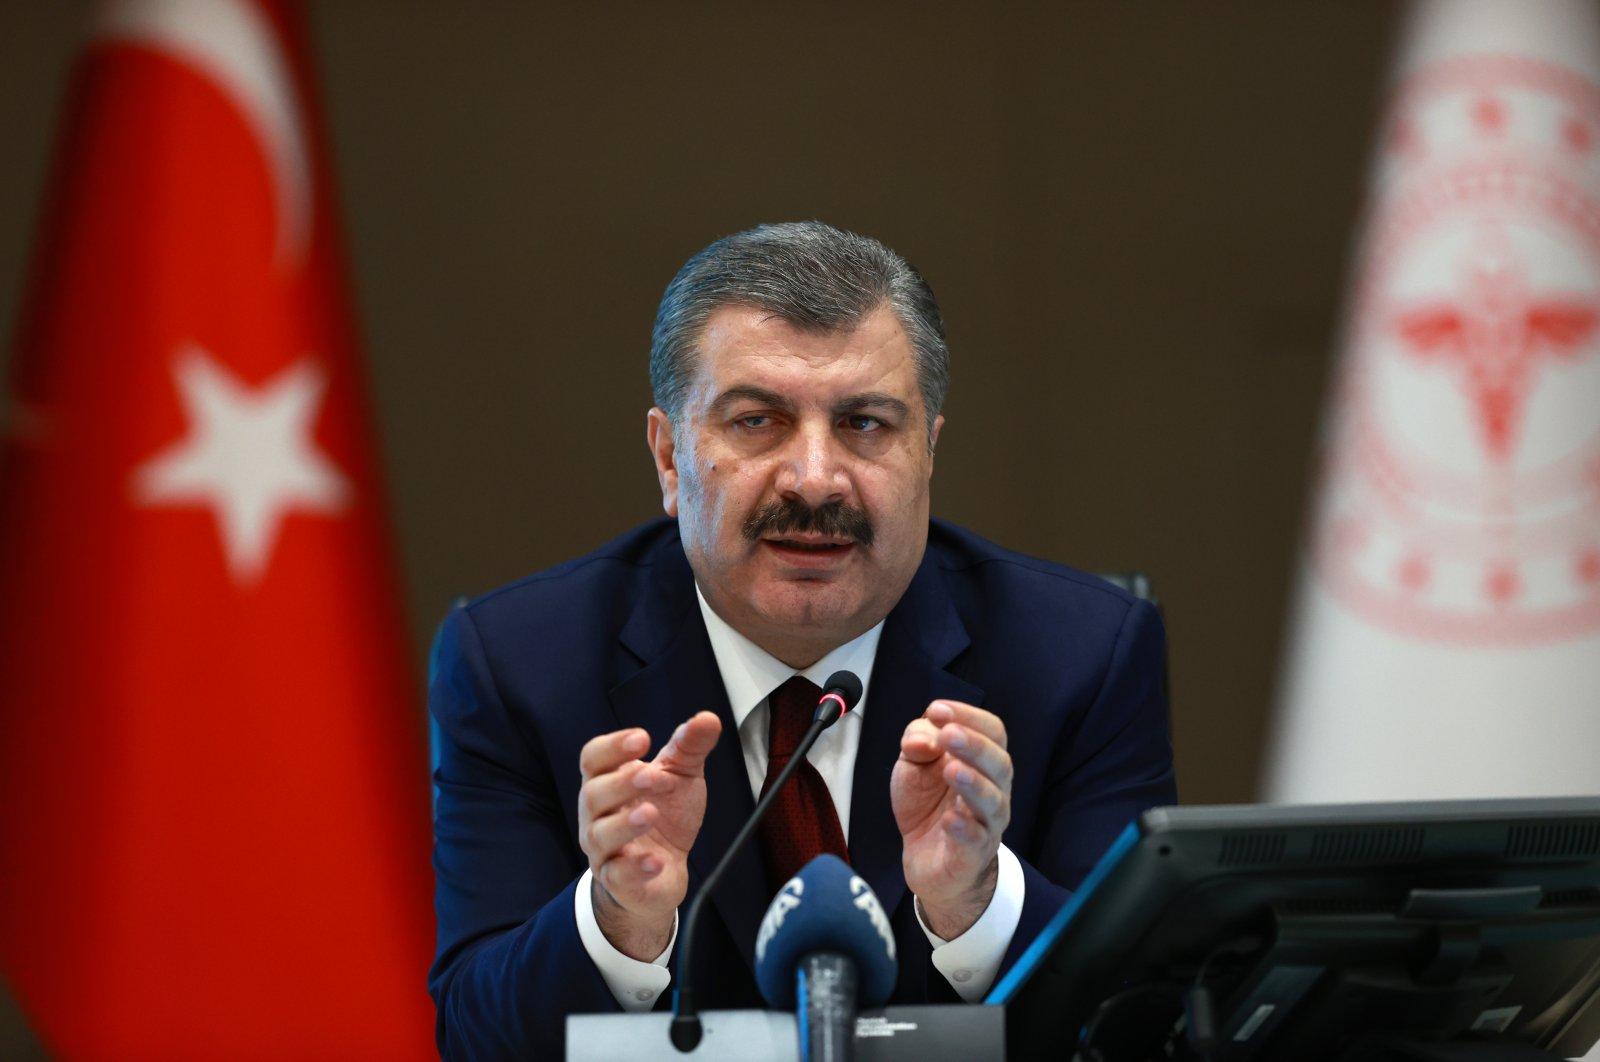 Health Minister Fahrettin Koca speaks at a press conference in Ankara, April 22, 2020 (AA Photo)